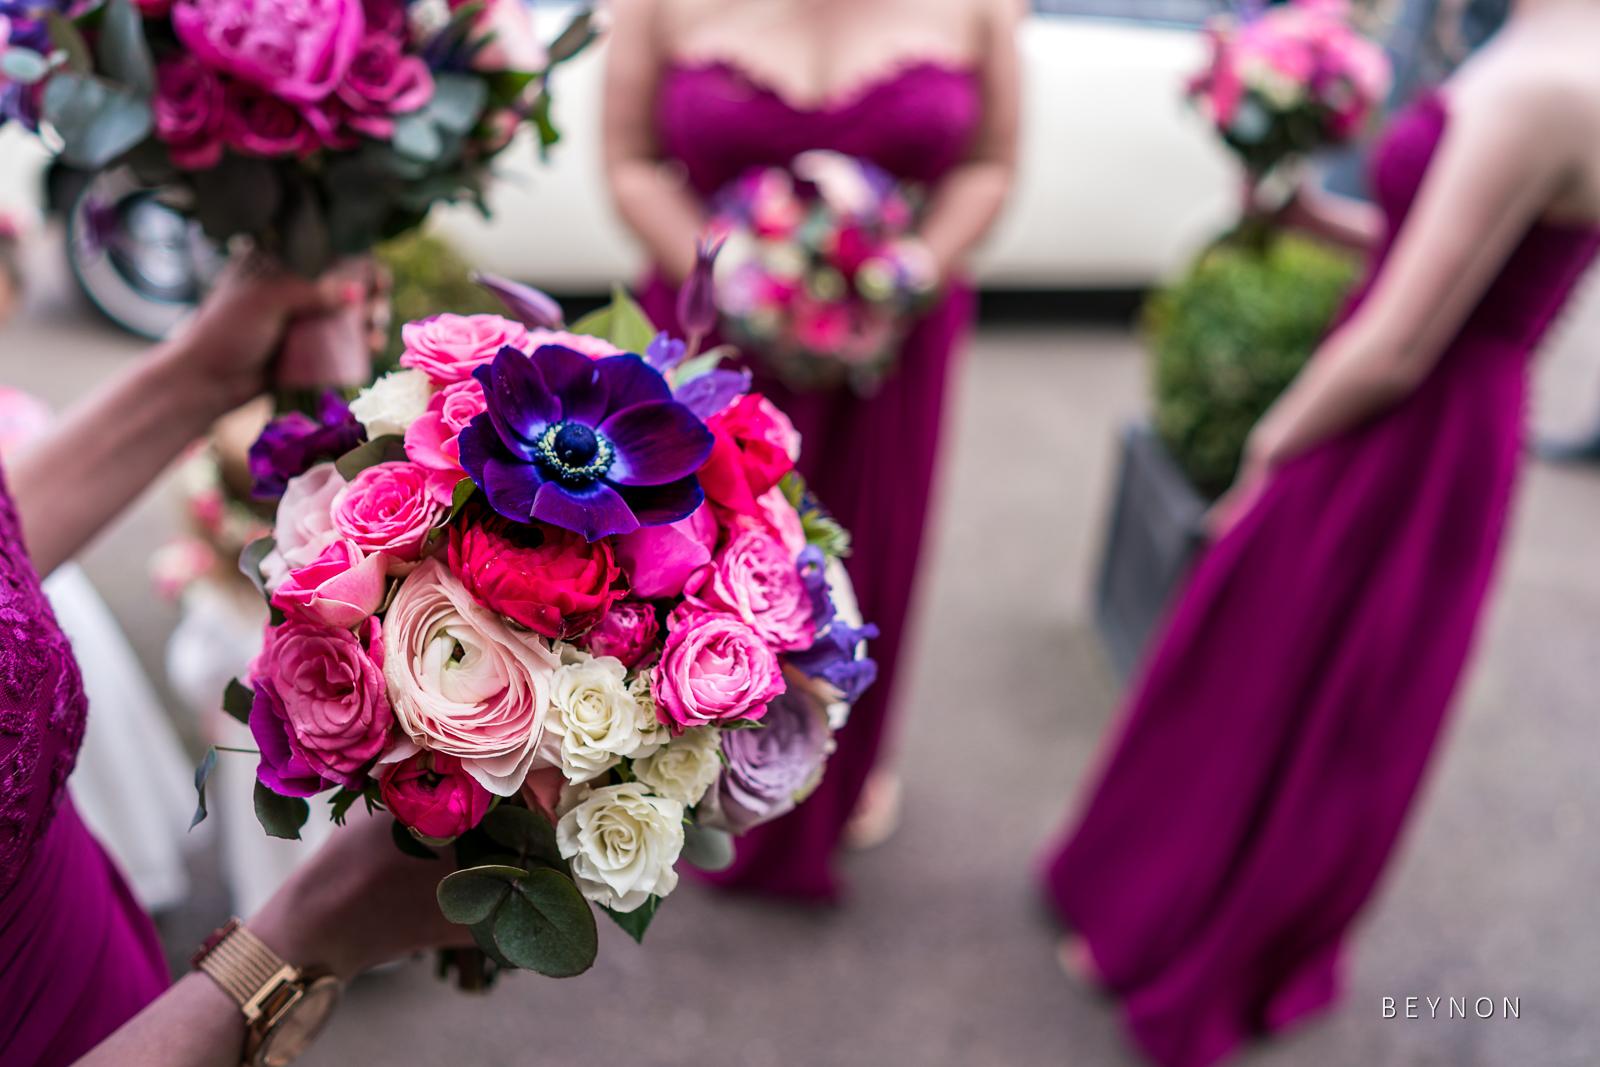 The Bridesmaids wait outside